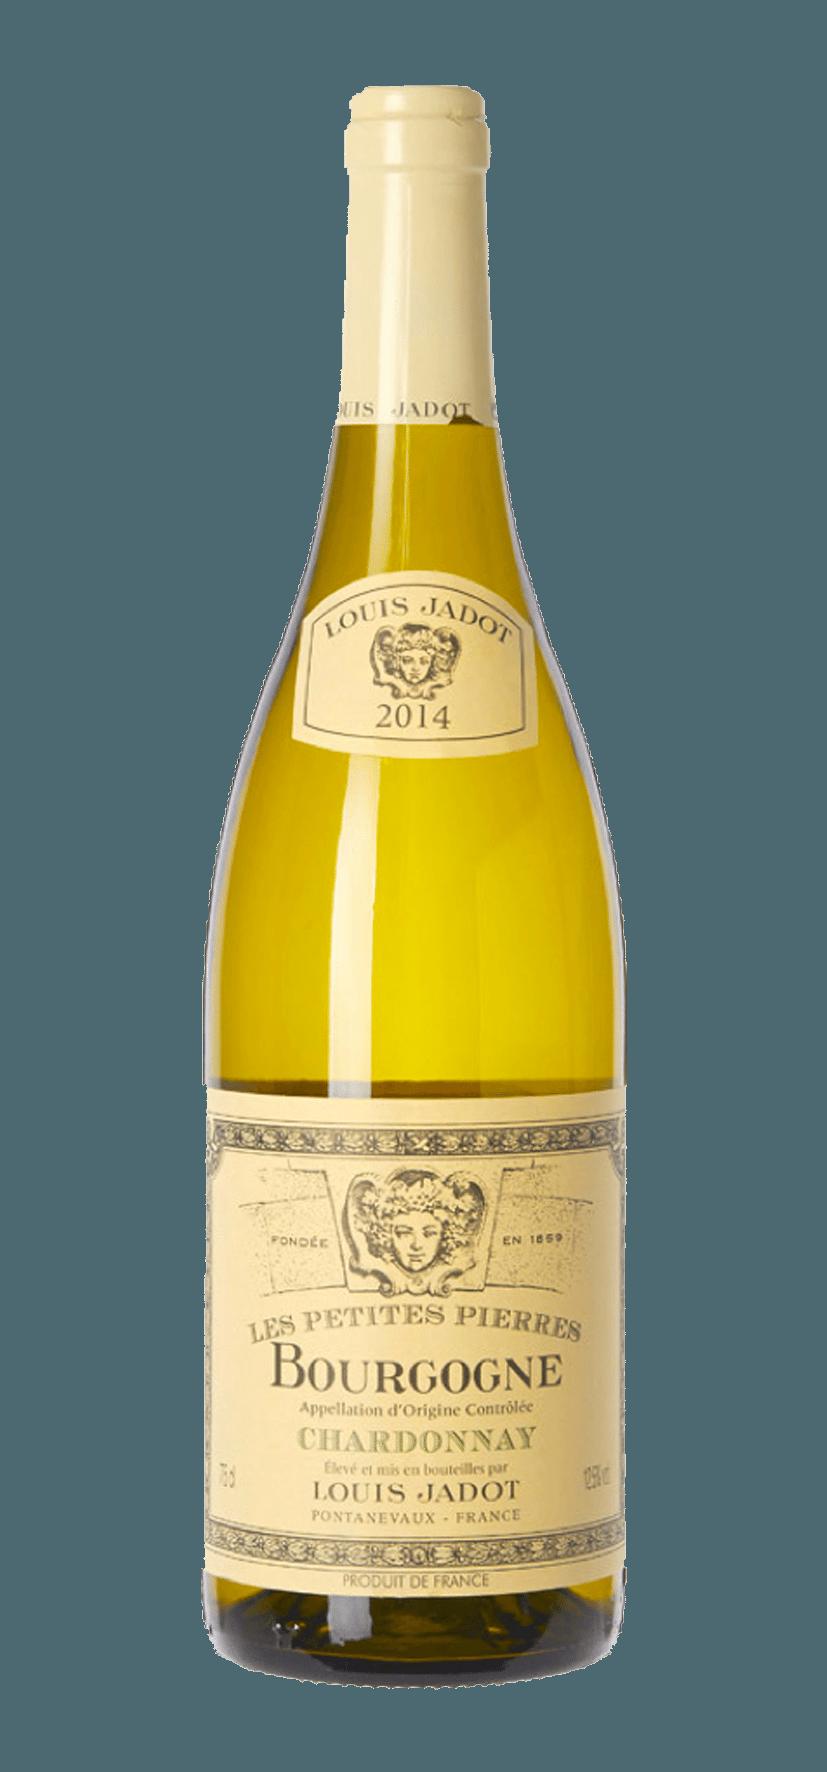 Louis Jadot Bourgogne Chardonnay Petites Pierres